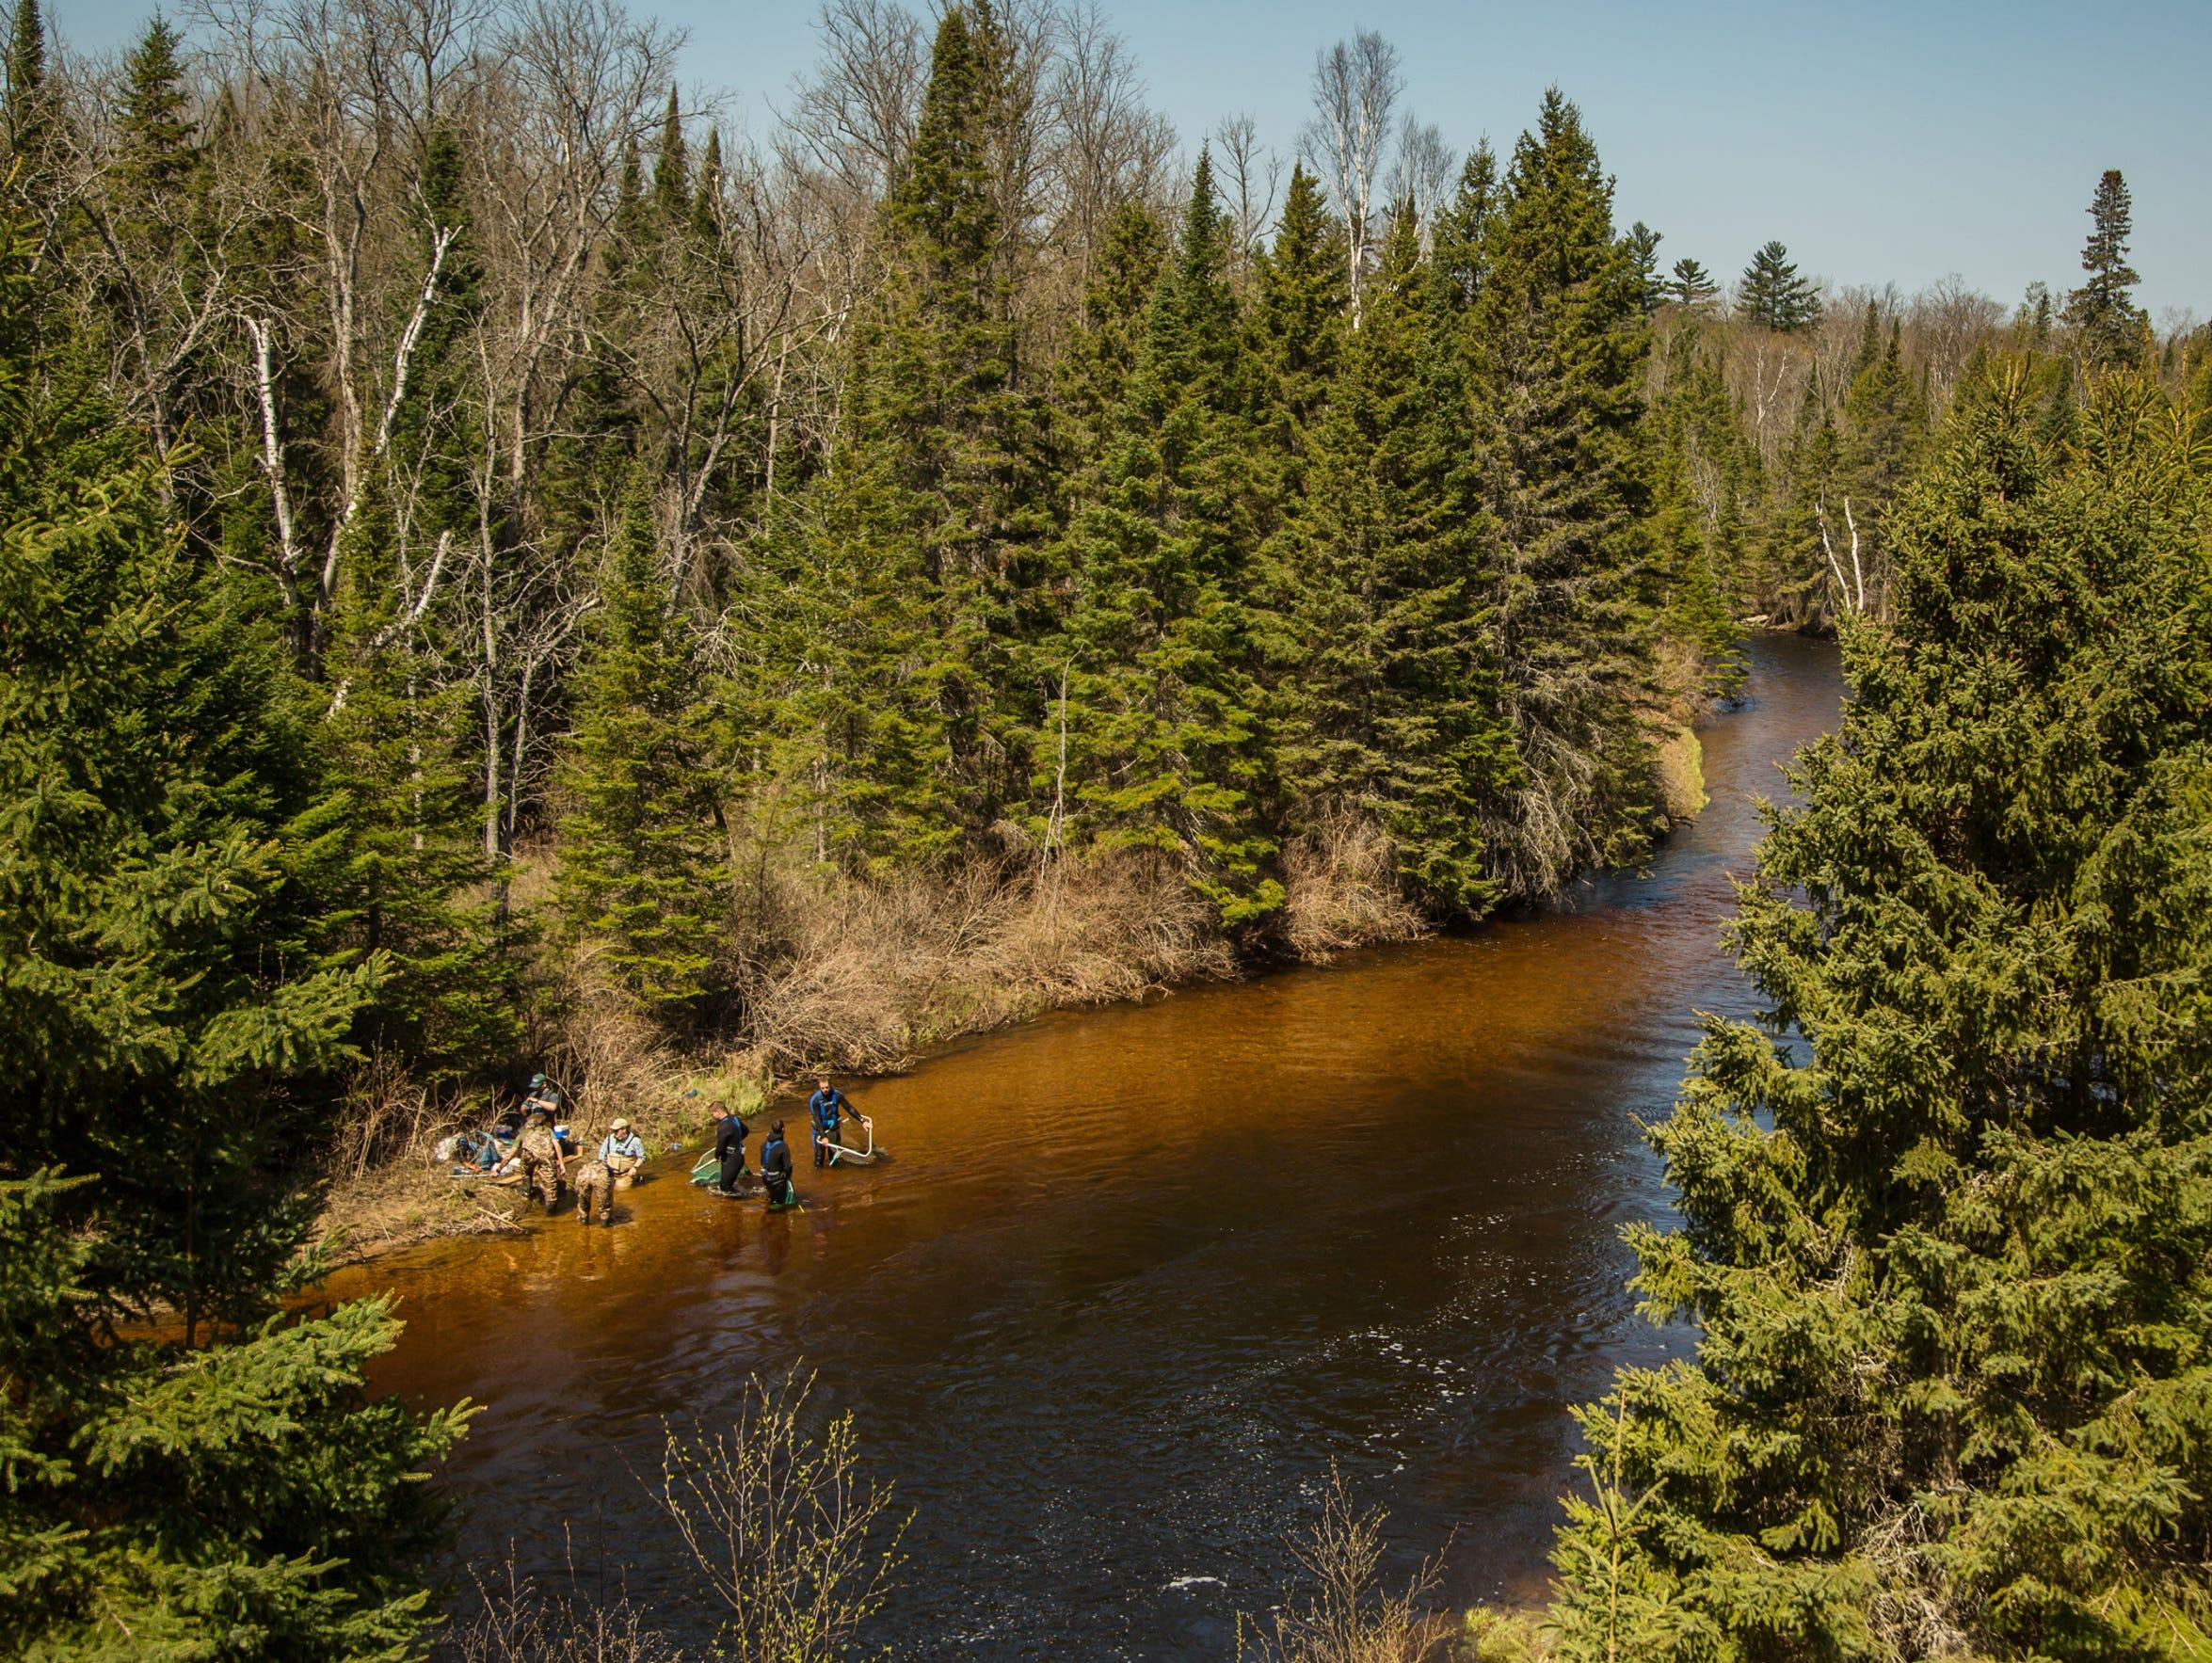 During sturgeon spawning season, researchers from Michigan